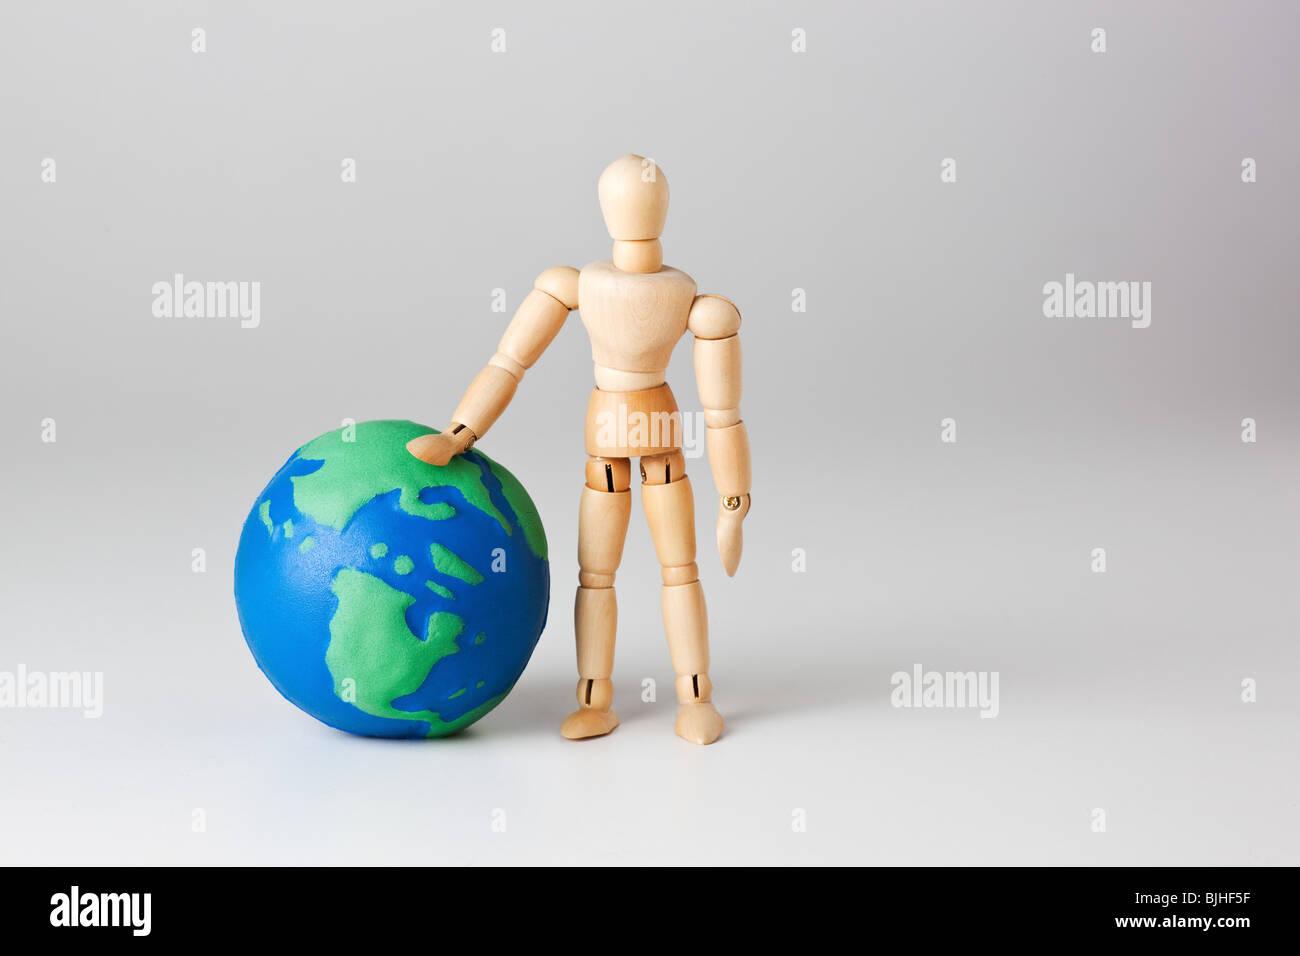 Maniqui con tierra en studion de juguete Imagen De Stock